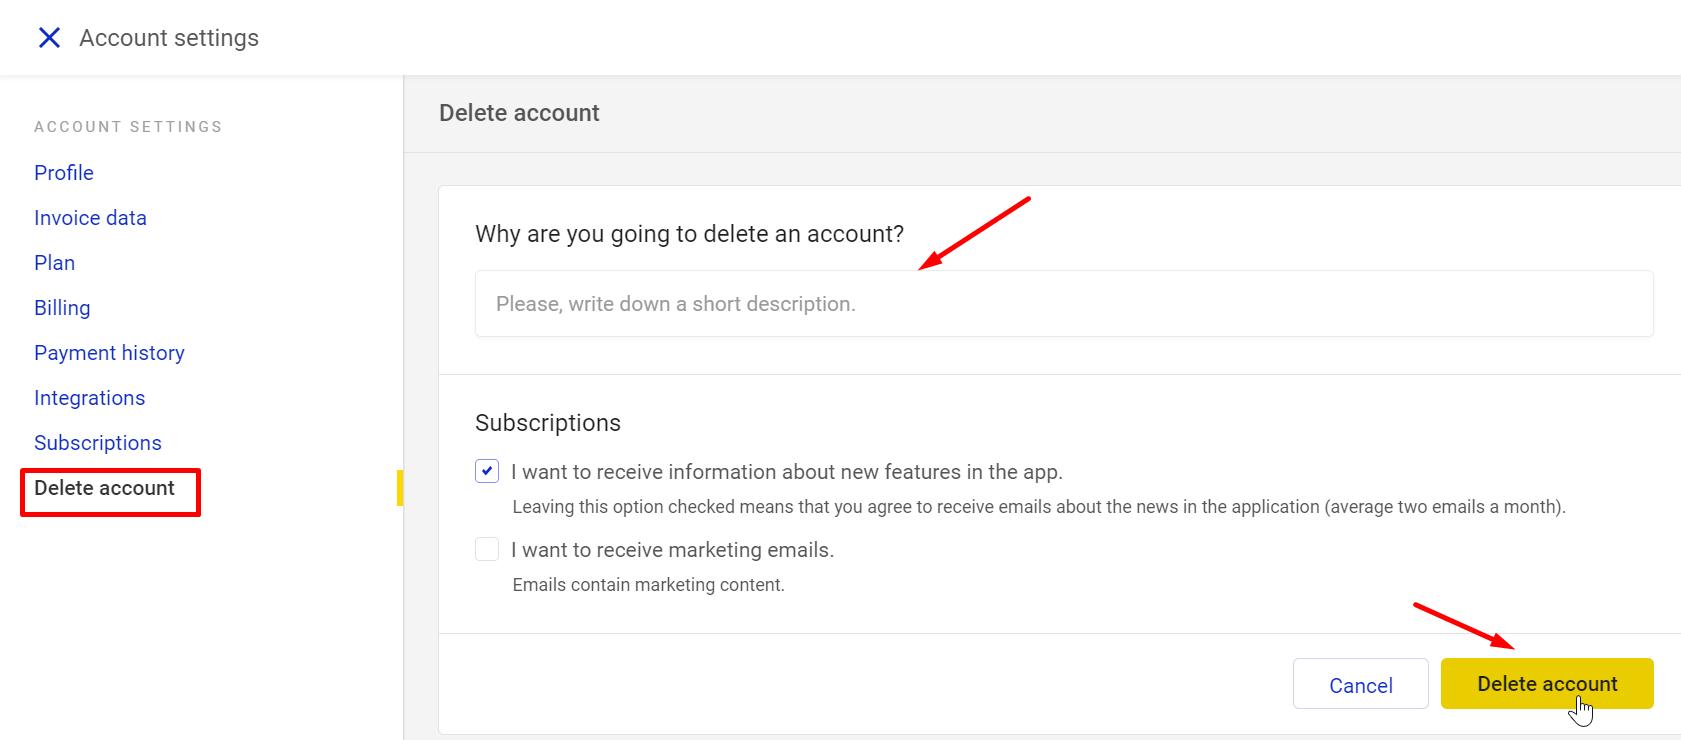 deleting an account in napoleoncat feedback